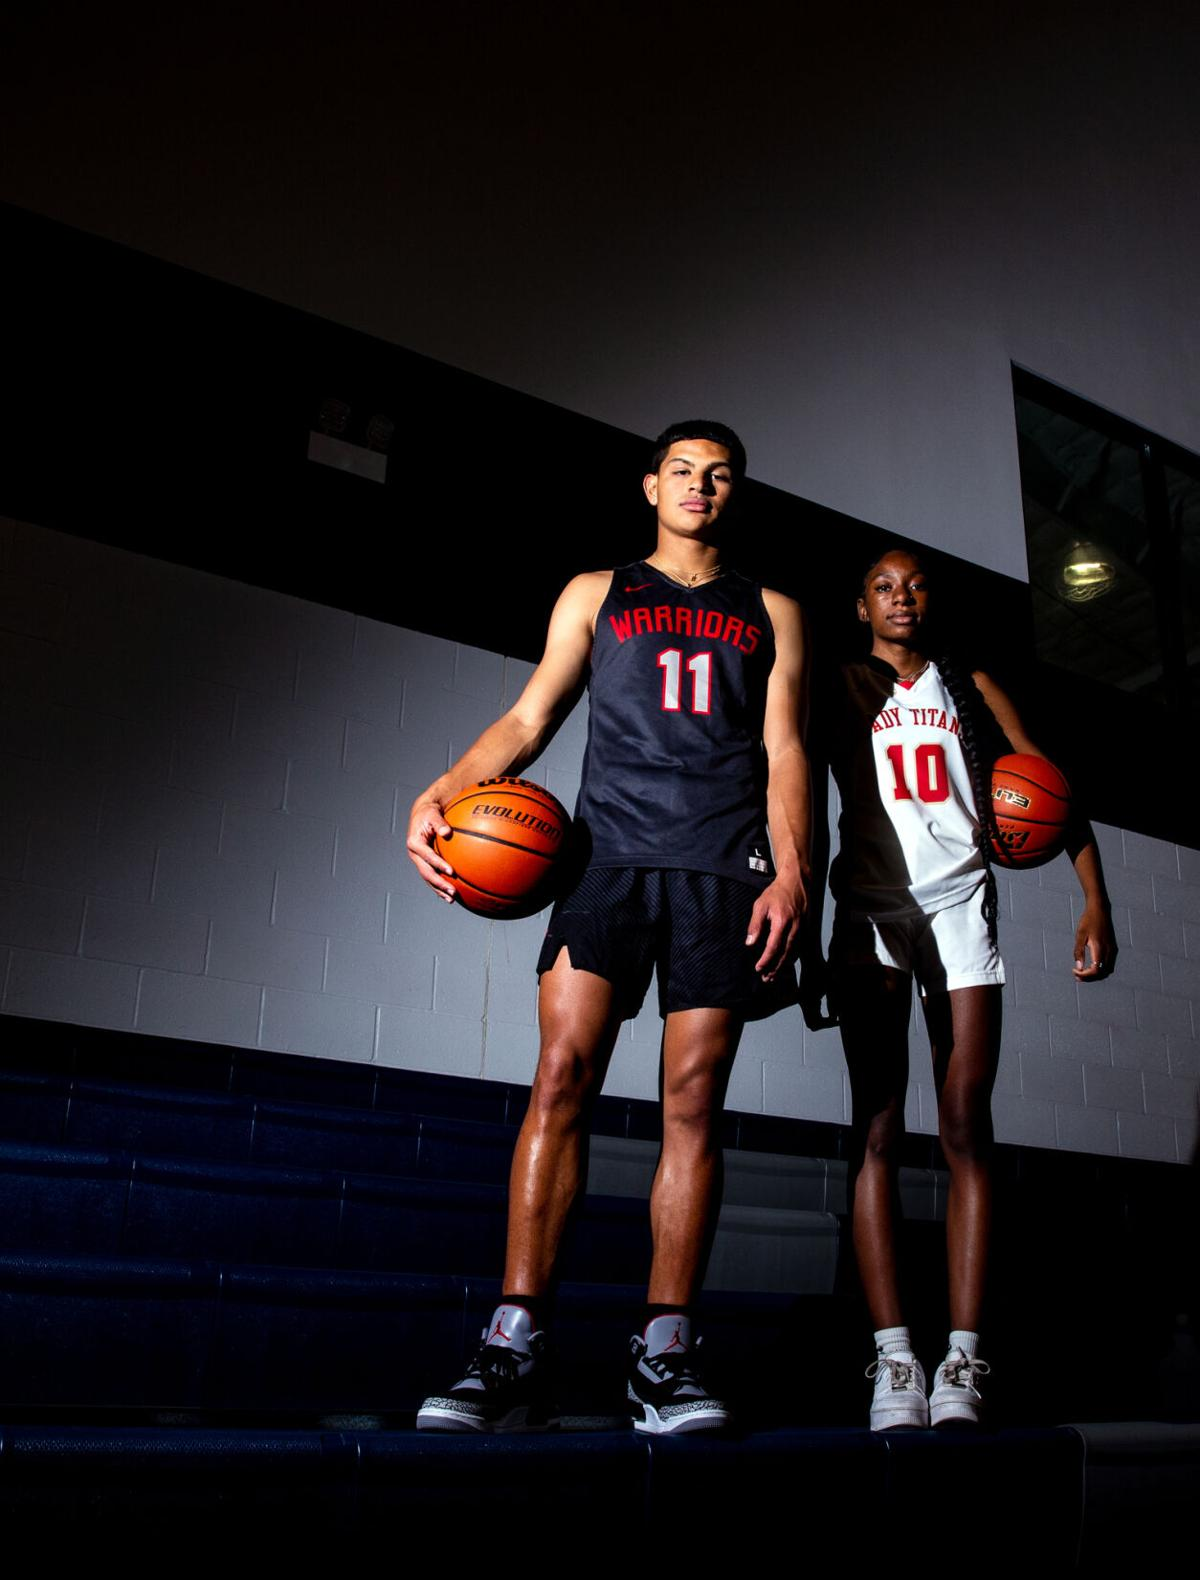 Basketball MVP Photo Shoot